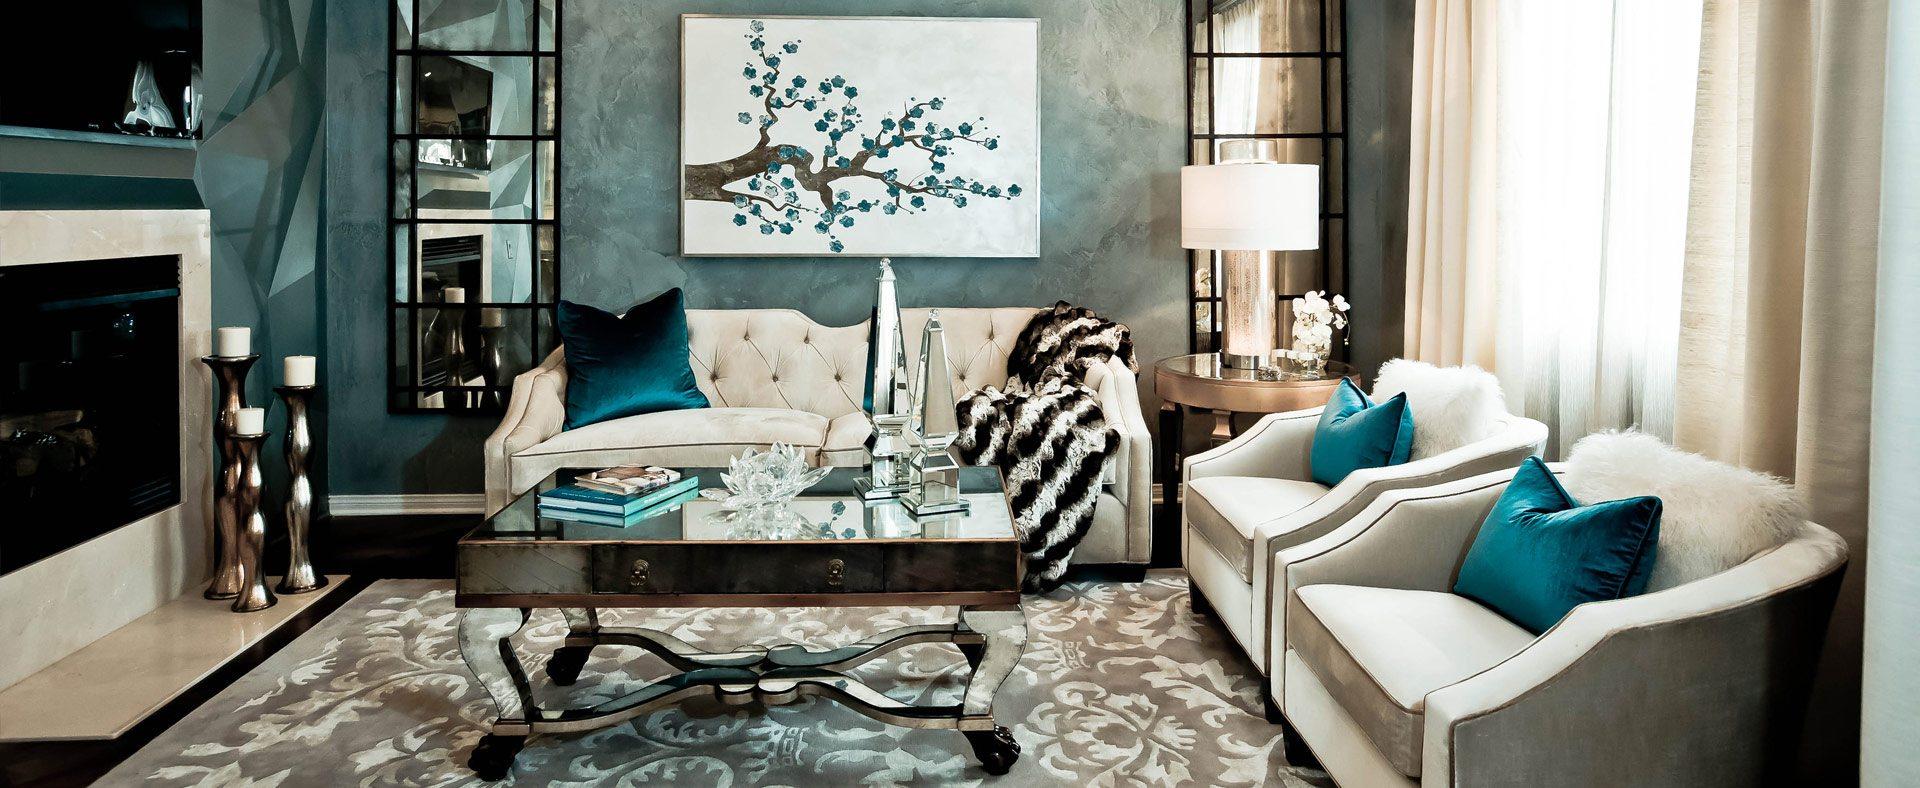 Charles Neal Atlanta Interior Design